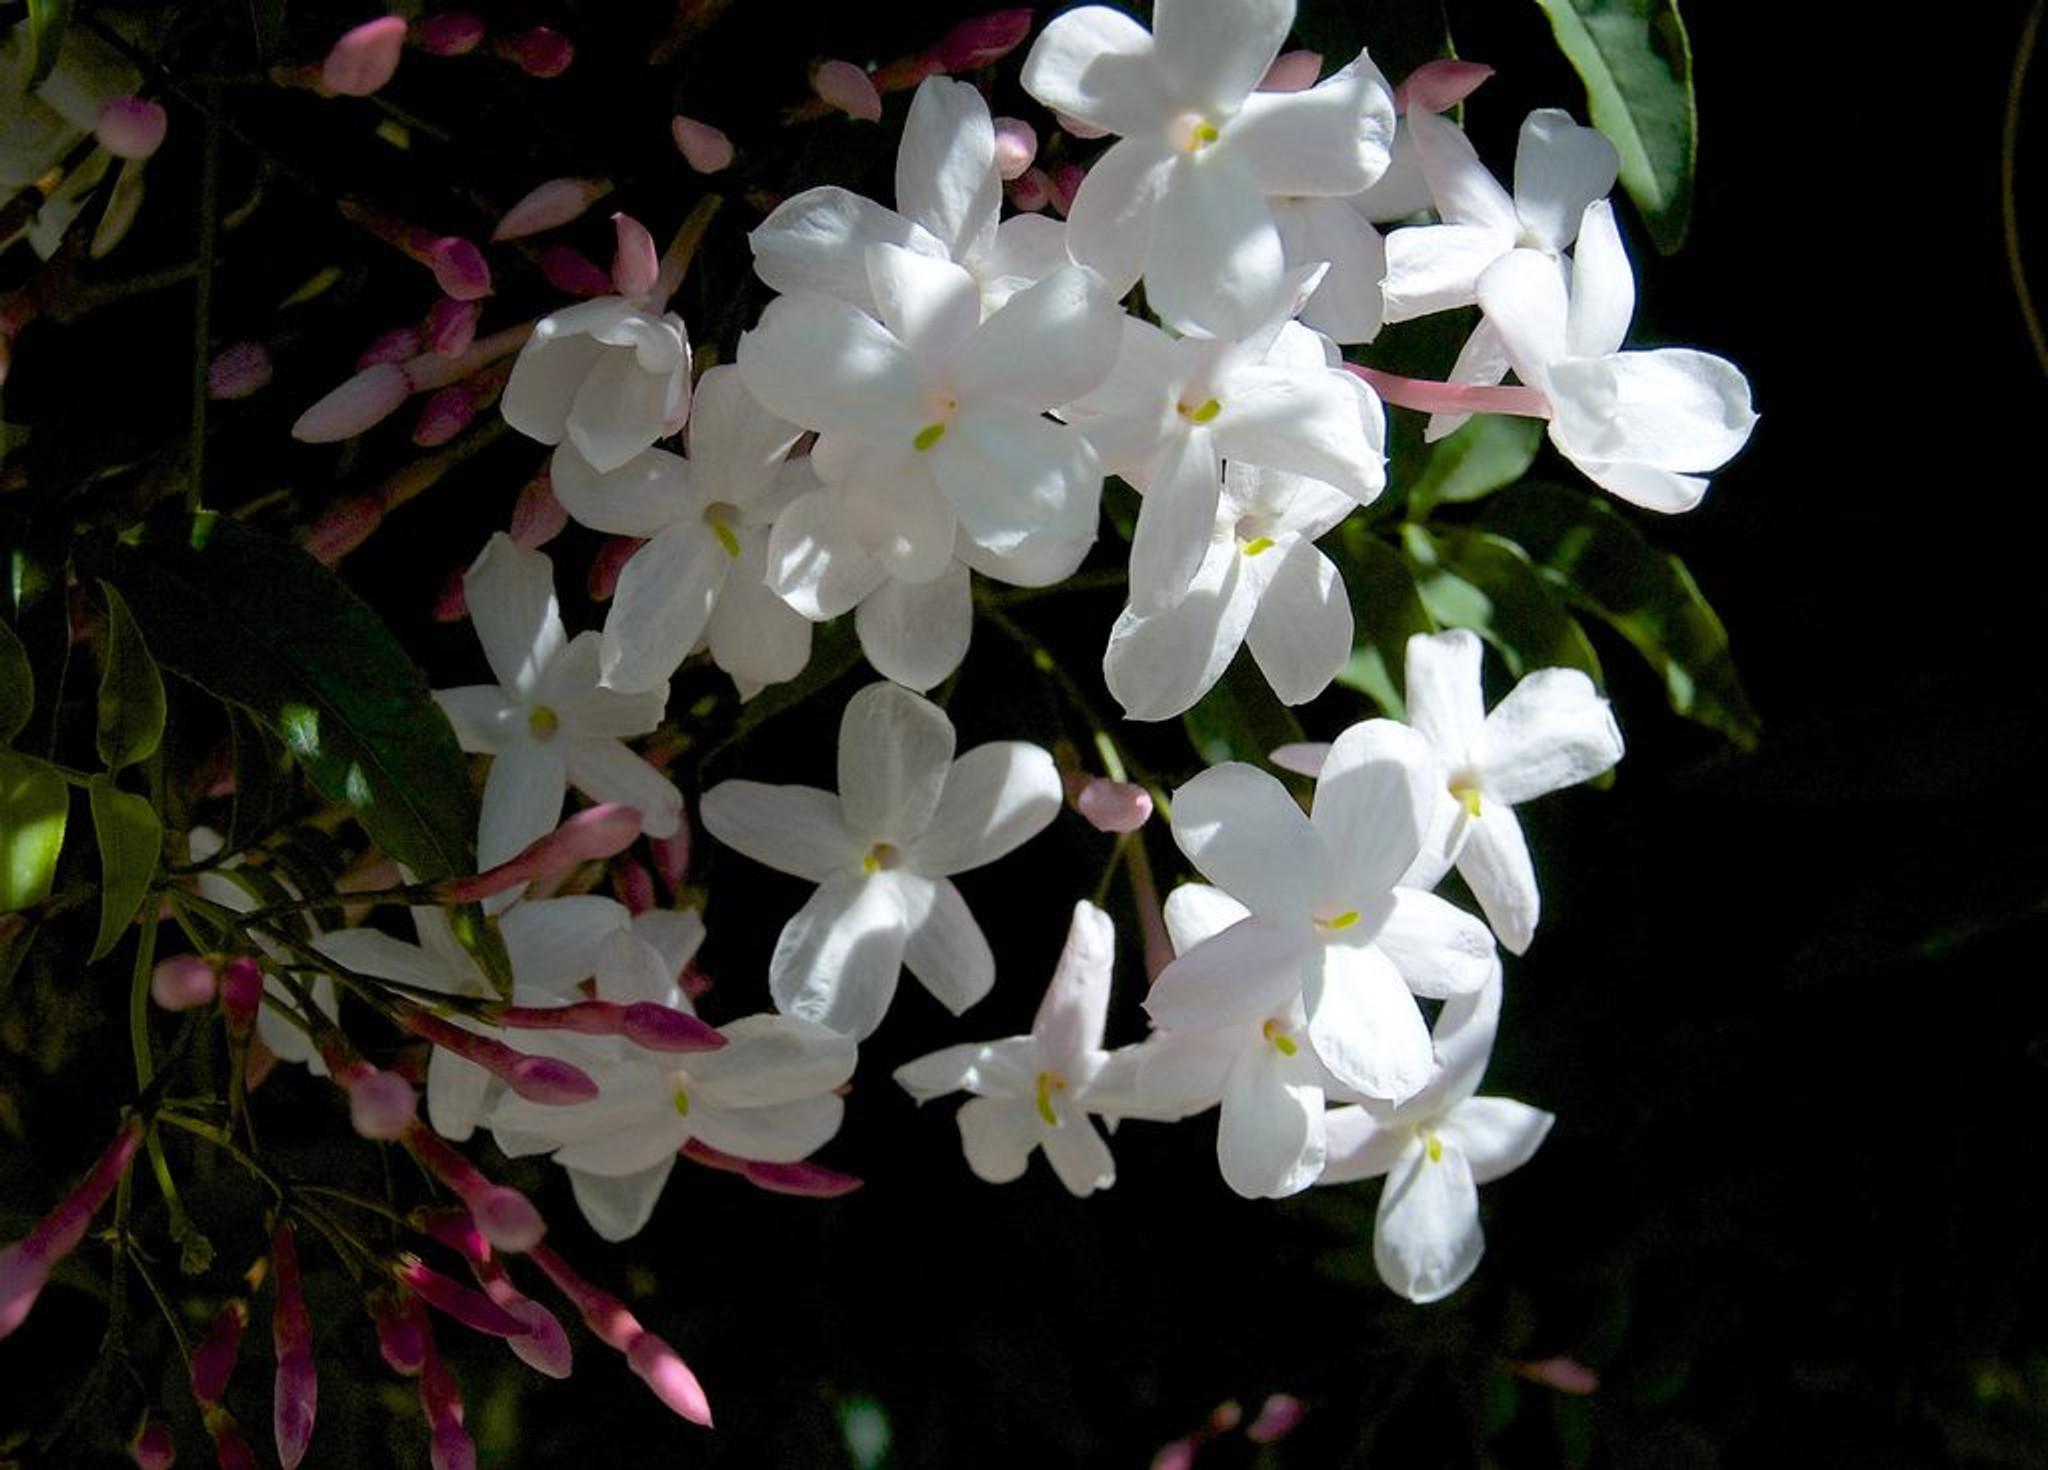 Many flowering Jasmine